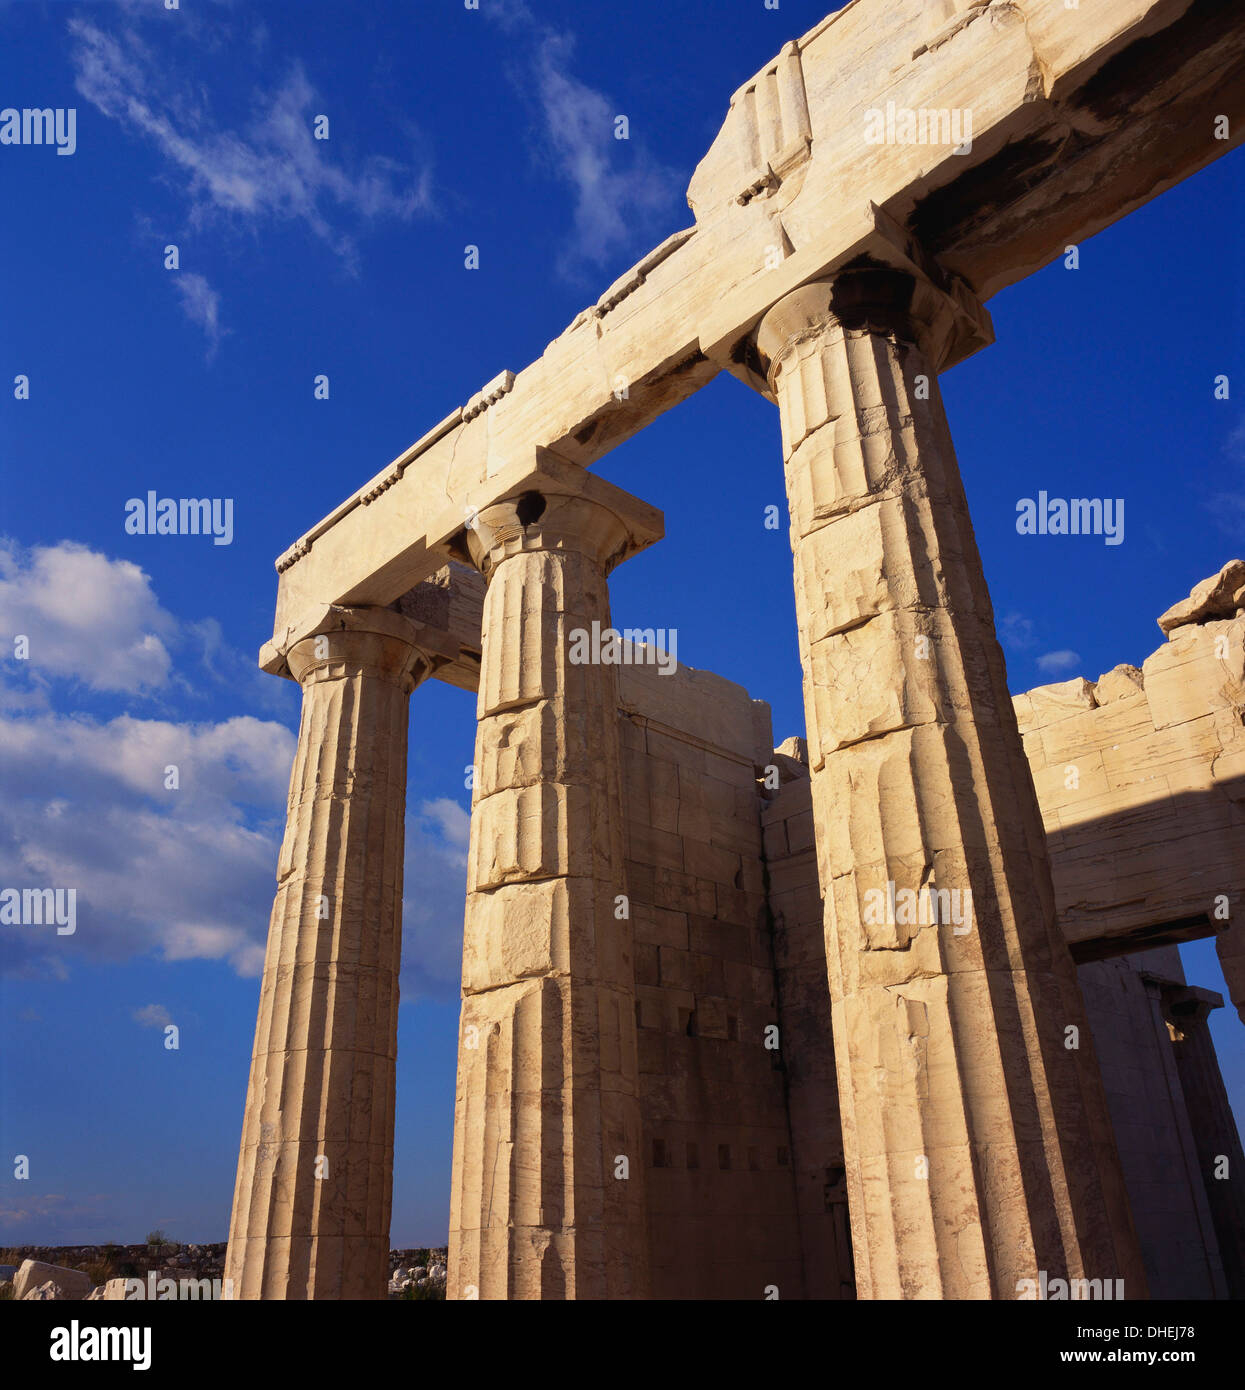 Propylaea, Acropolis, Athens, Greece Stock Photo